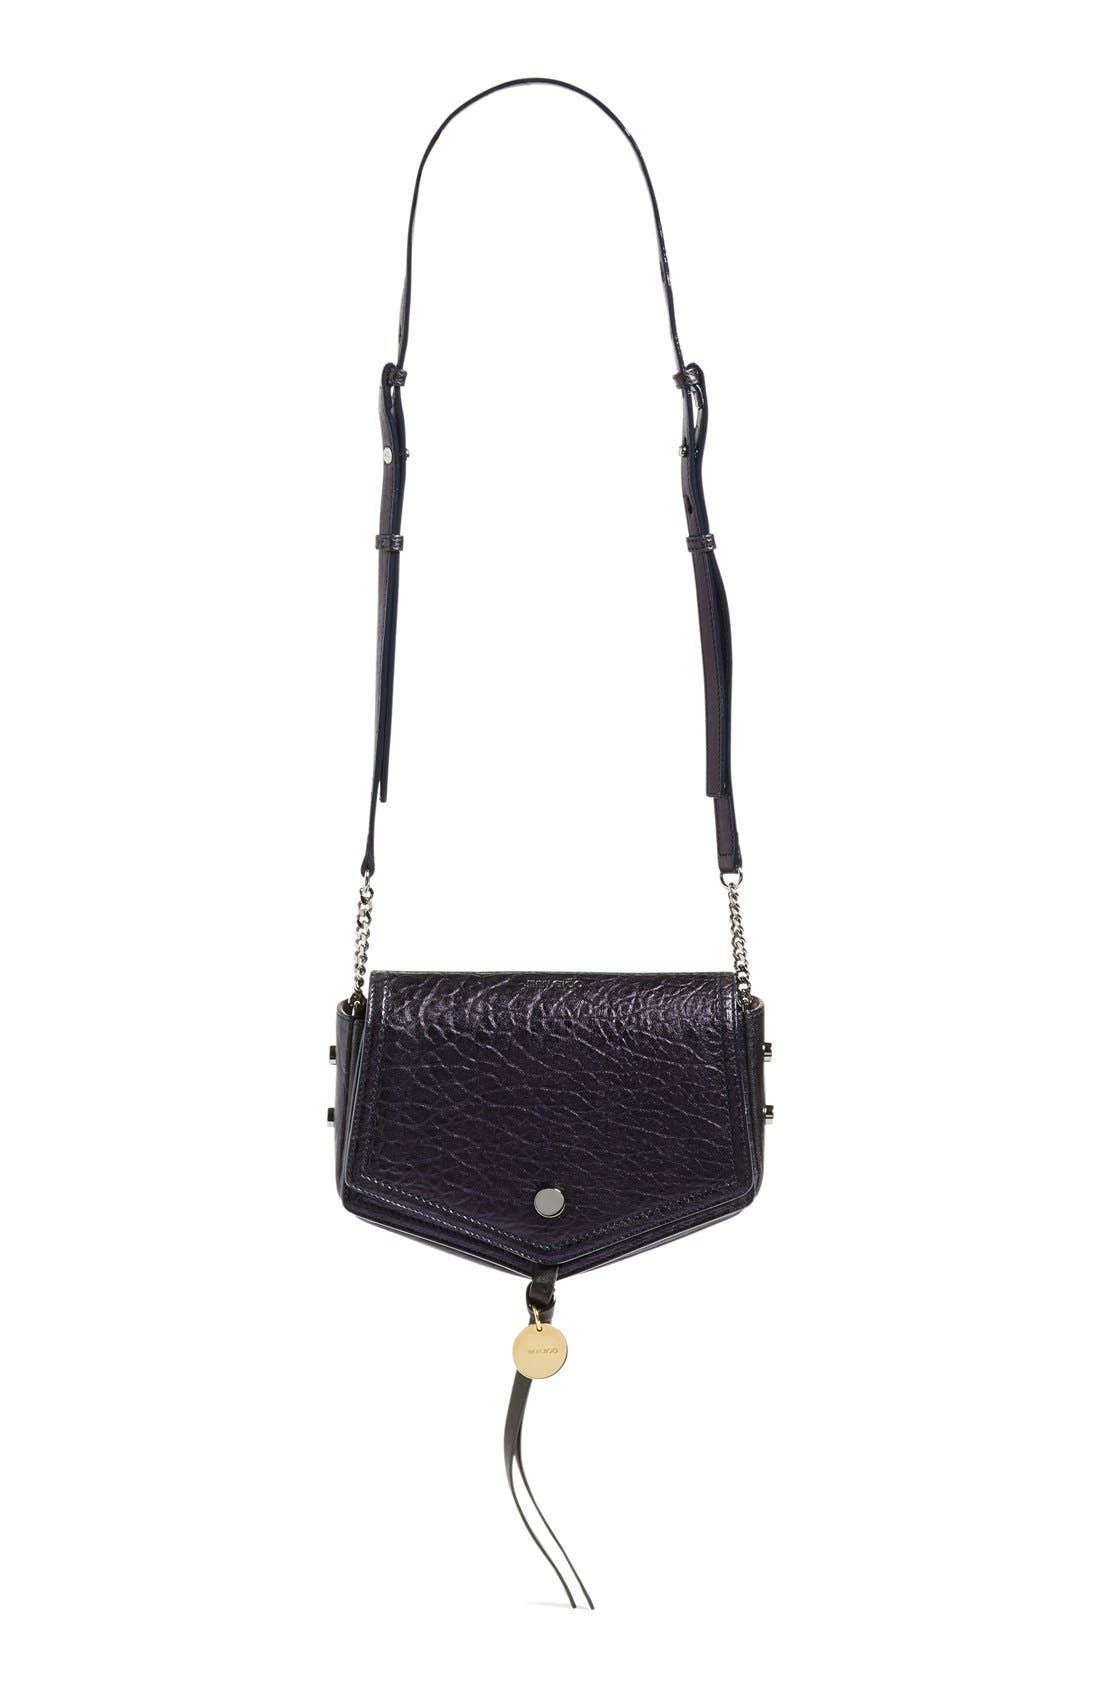 Alternate Image 1 Selected - Jimmy Choo Arrow Metallic Grained Leather Shoulder Bag